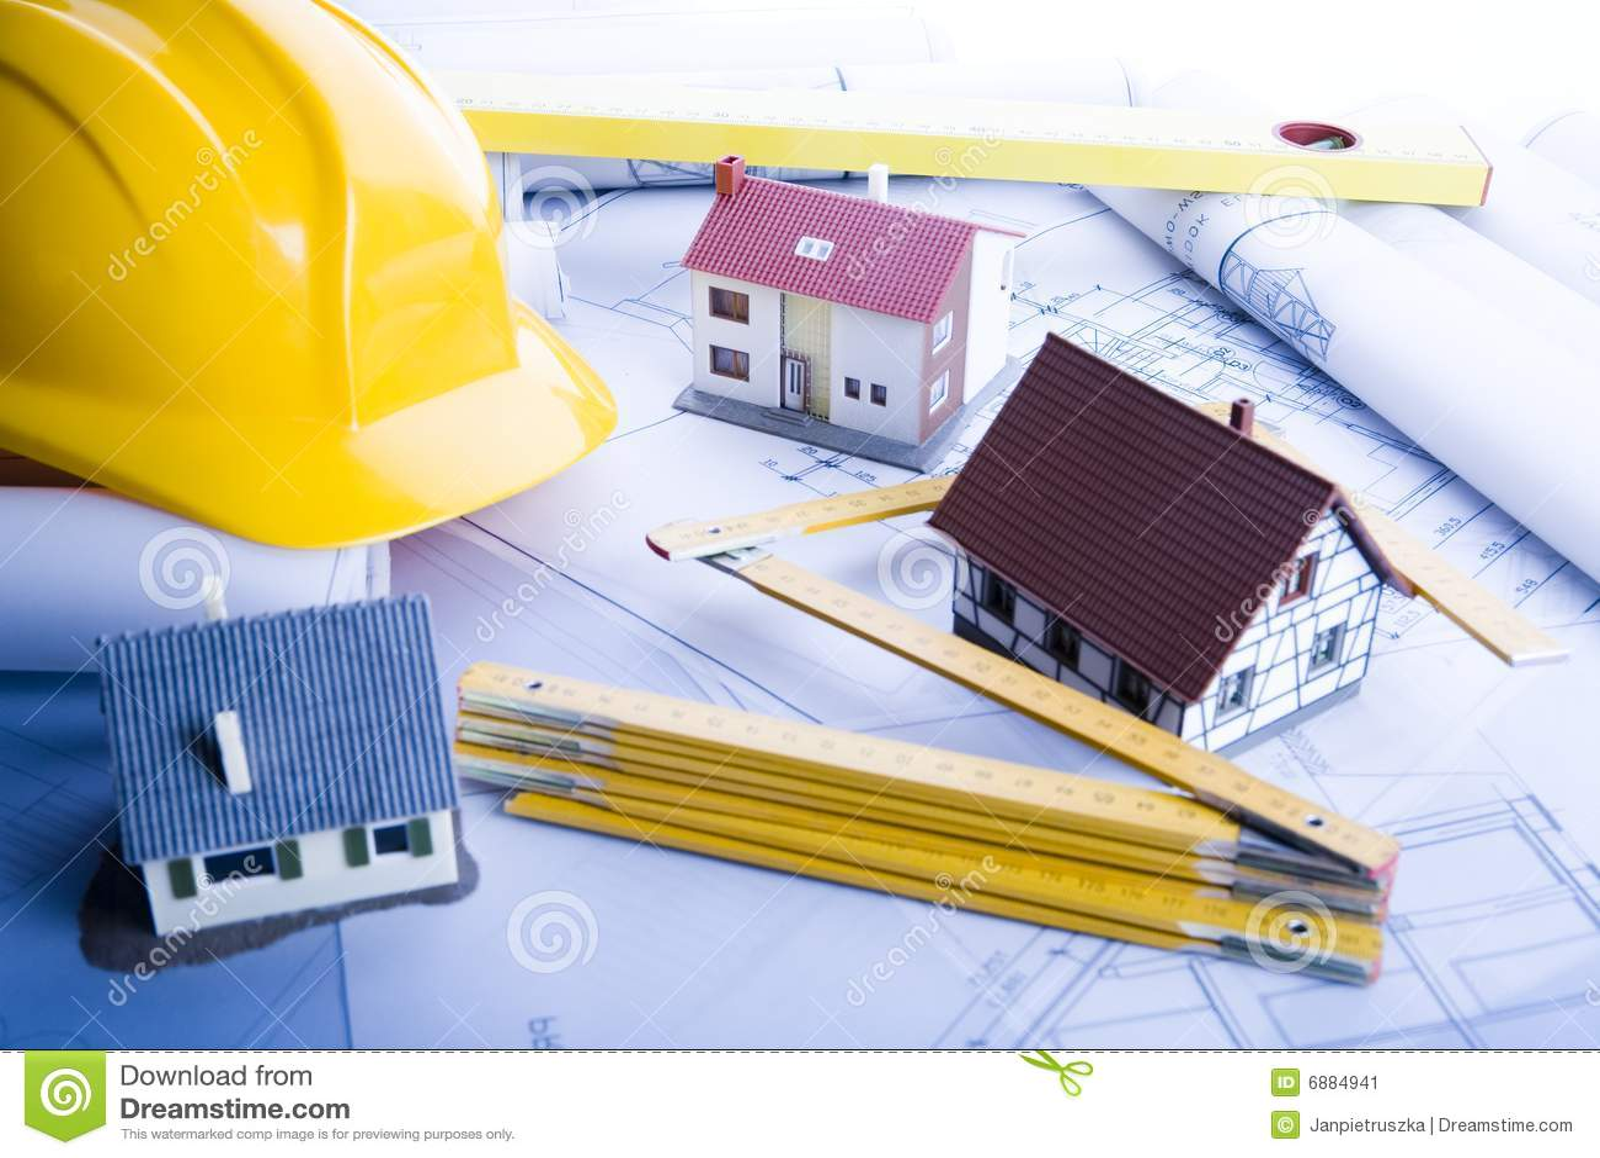 House designer stock image image 6884941 for Housedesigner com